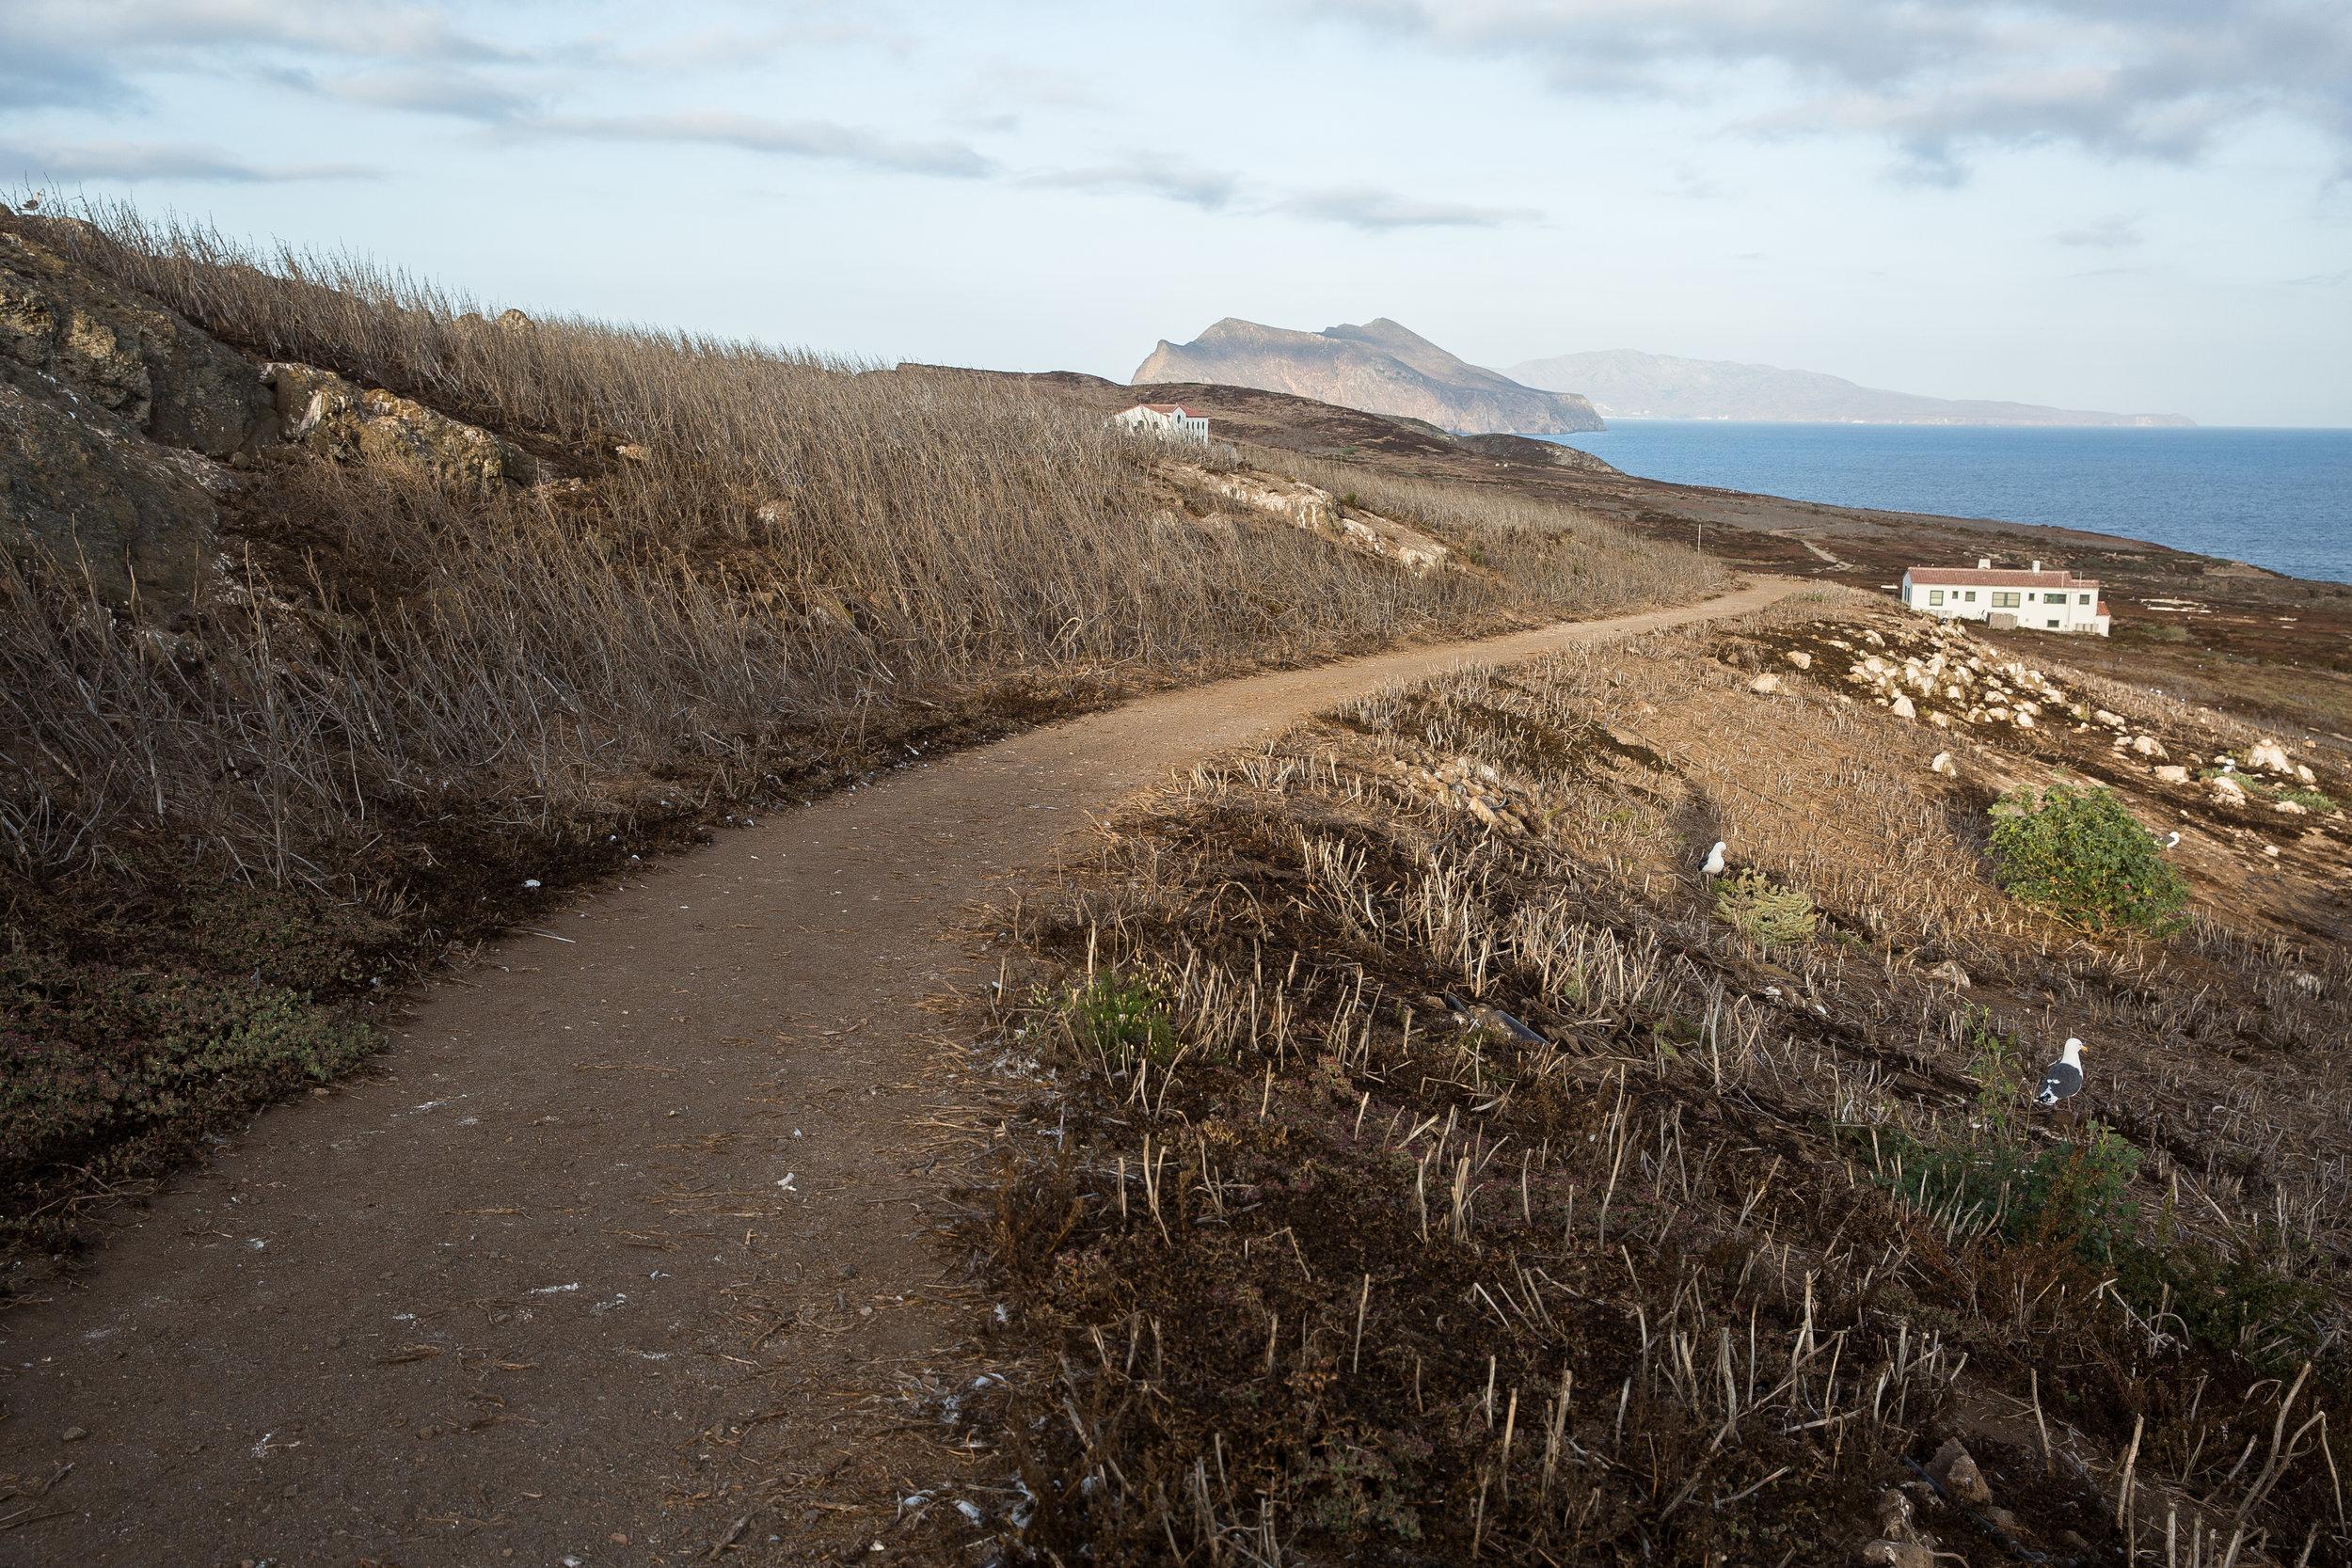 20170916-Anacapa Island REVO-14796.jpg